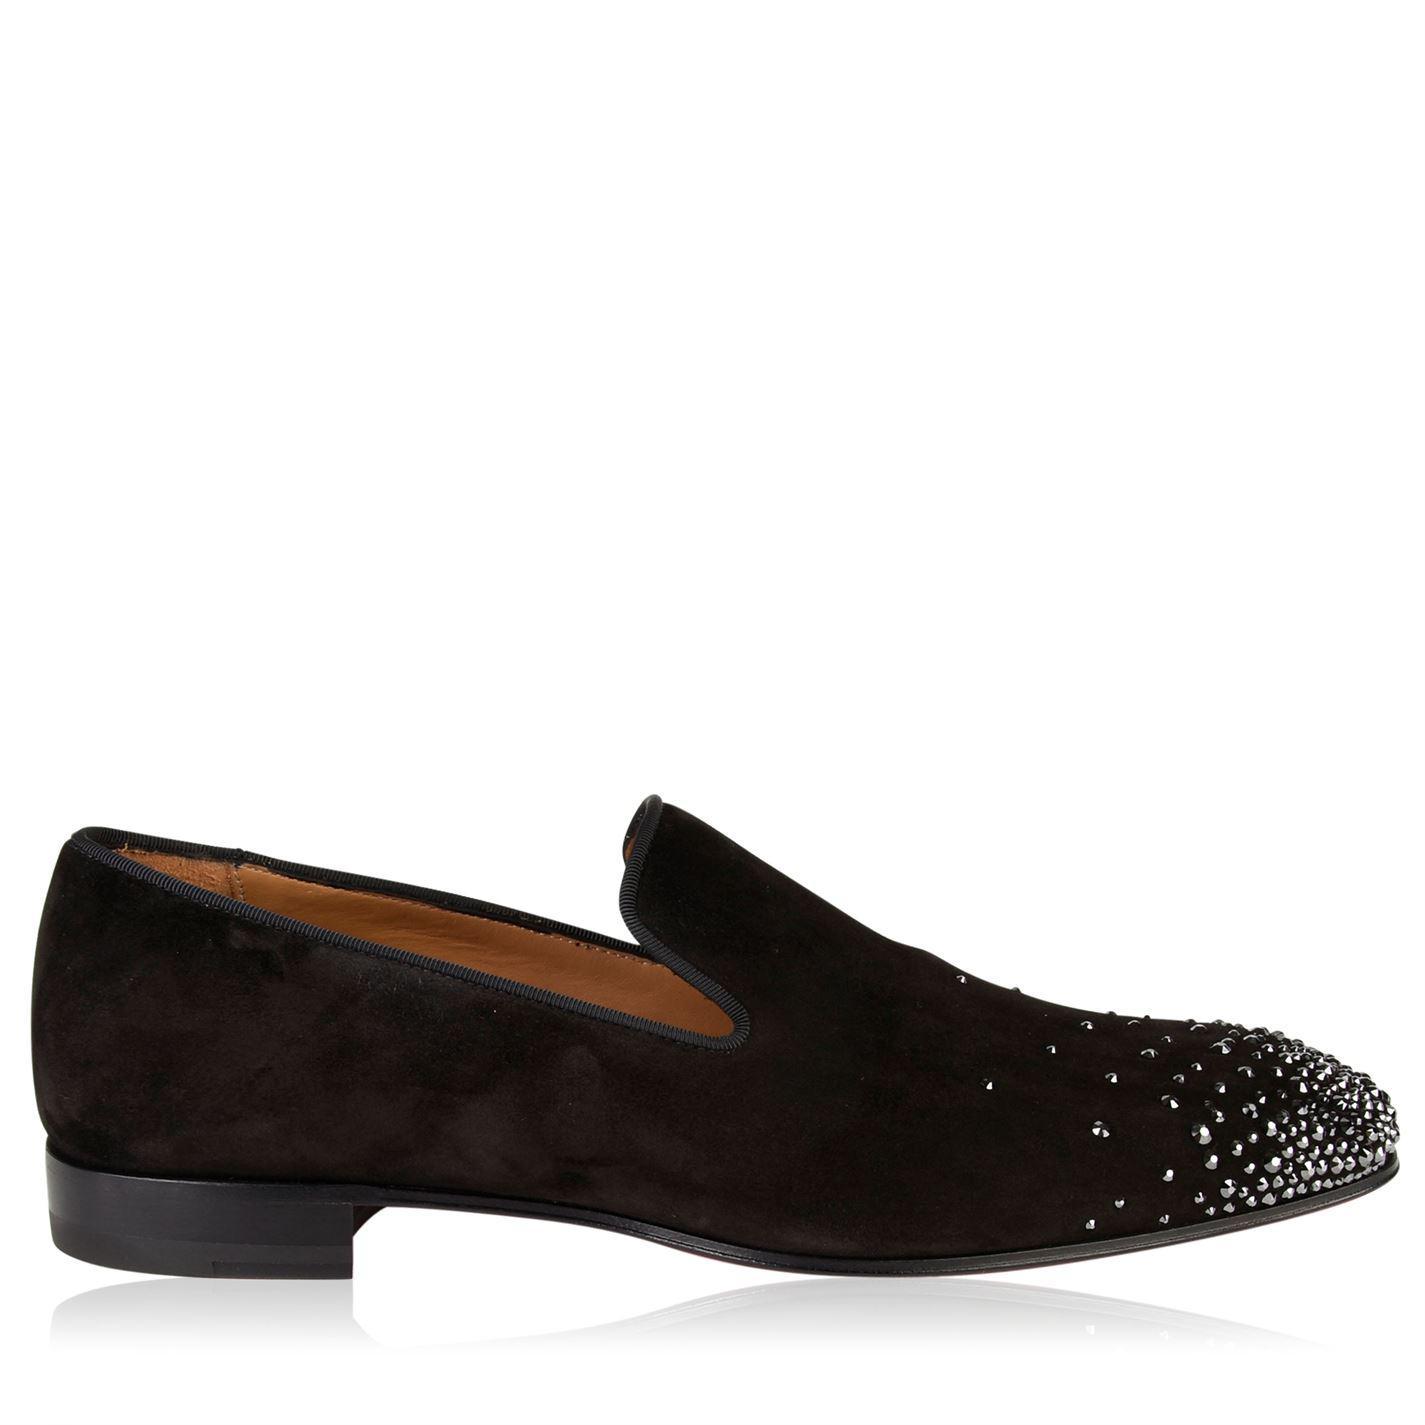 285a75f2abee Christian Louboutin Dandelion Loafers in Black for Men - Lyst